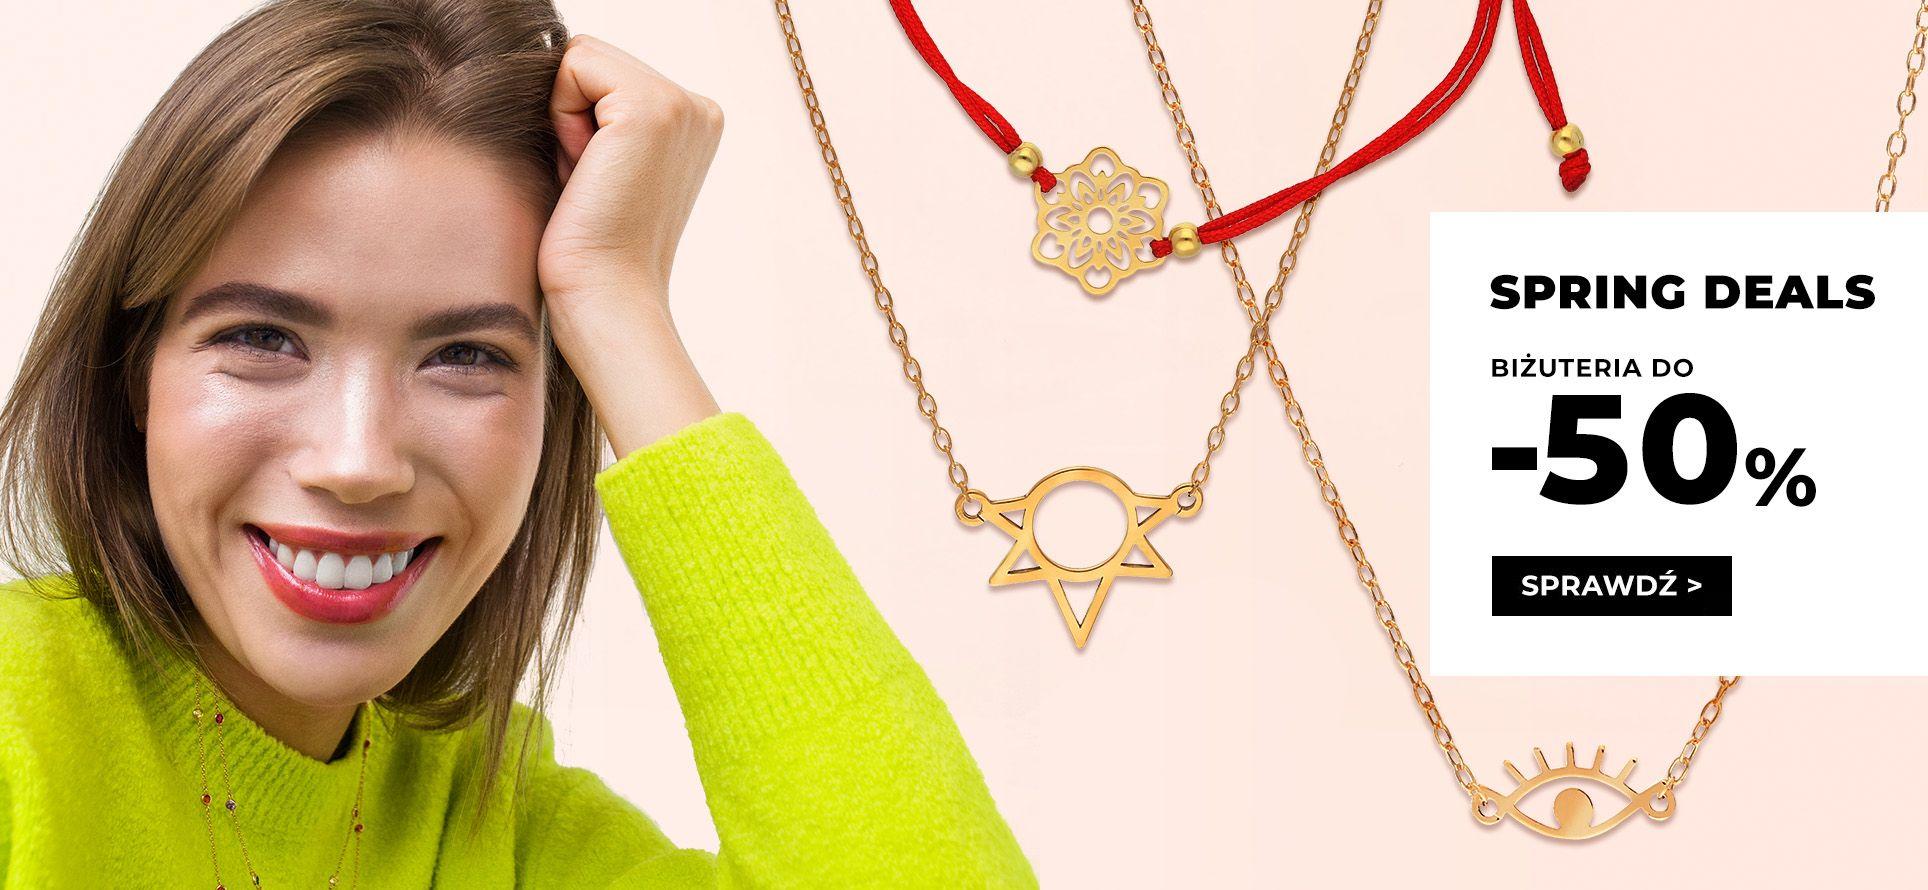 Picky Pica: do 50% rabatu na biżuterię damską